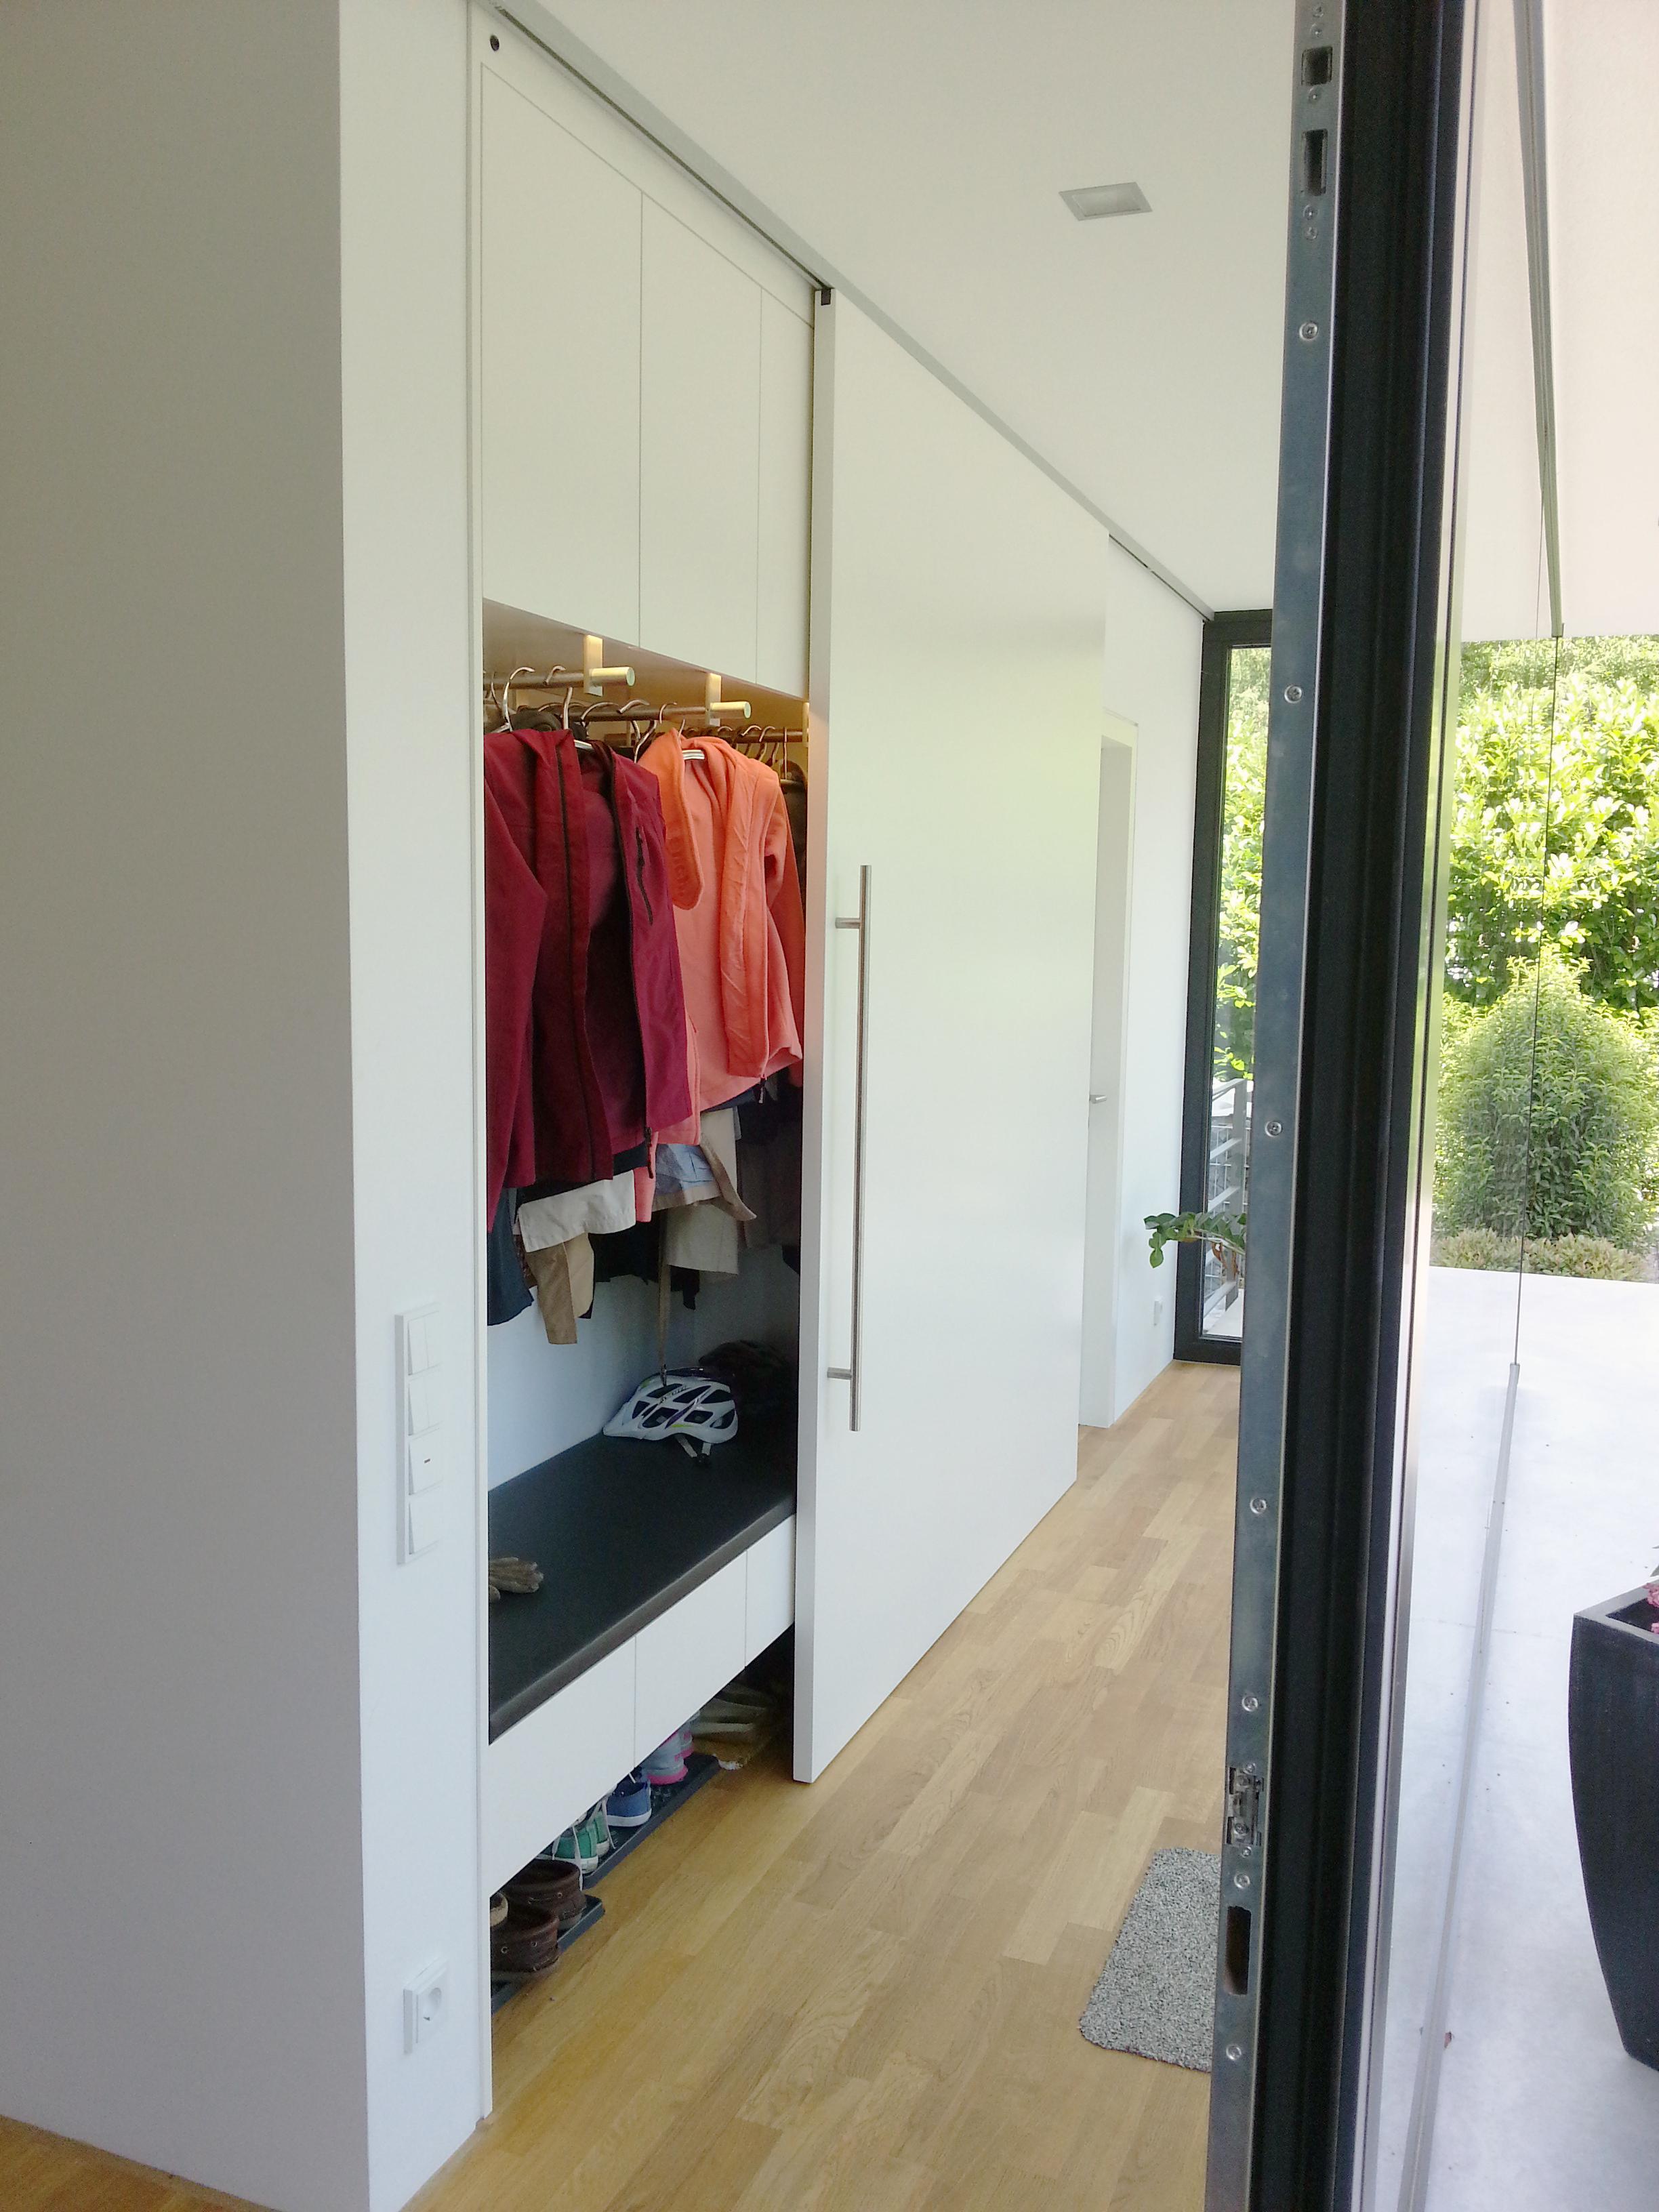 Innentüren aus Karlsruhe | Hammer Margrander Interior